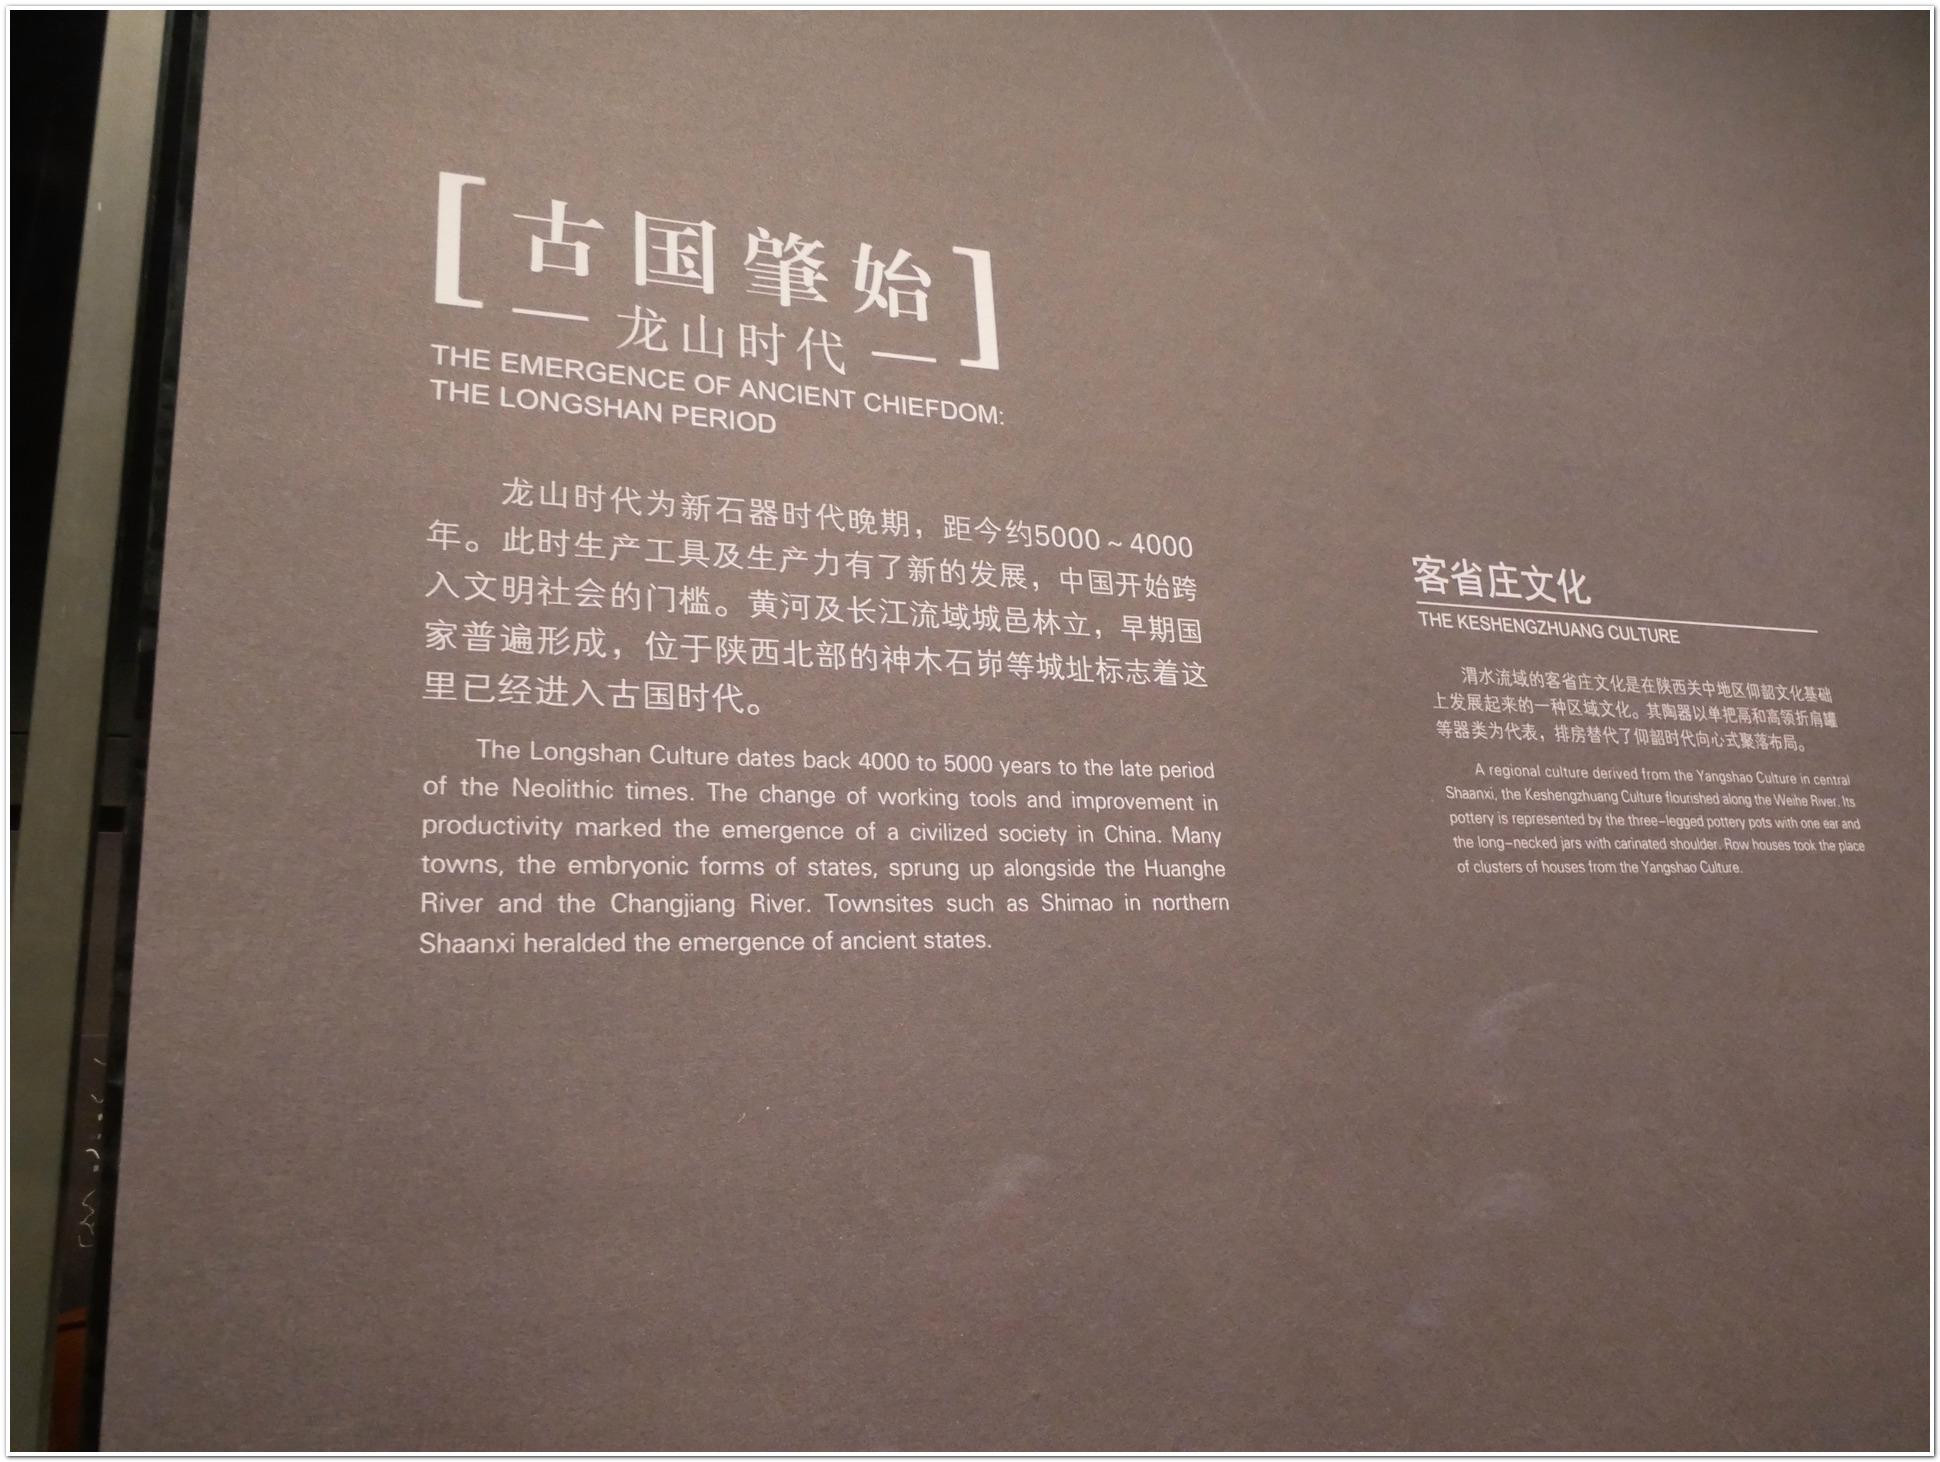 P1110095.jpg